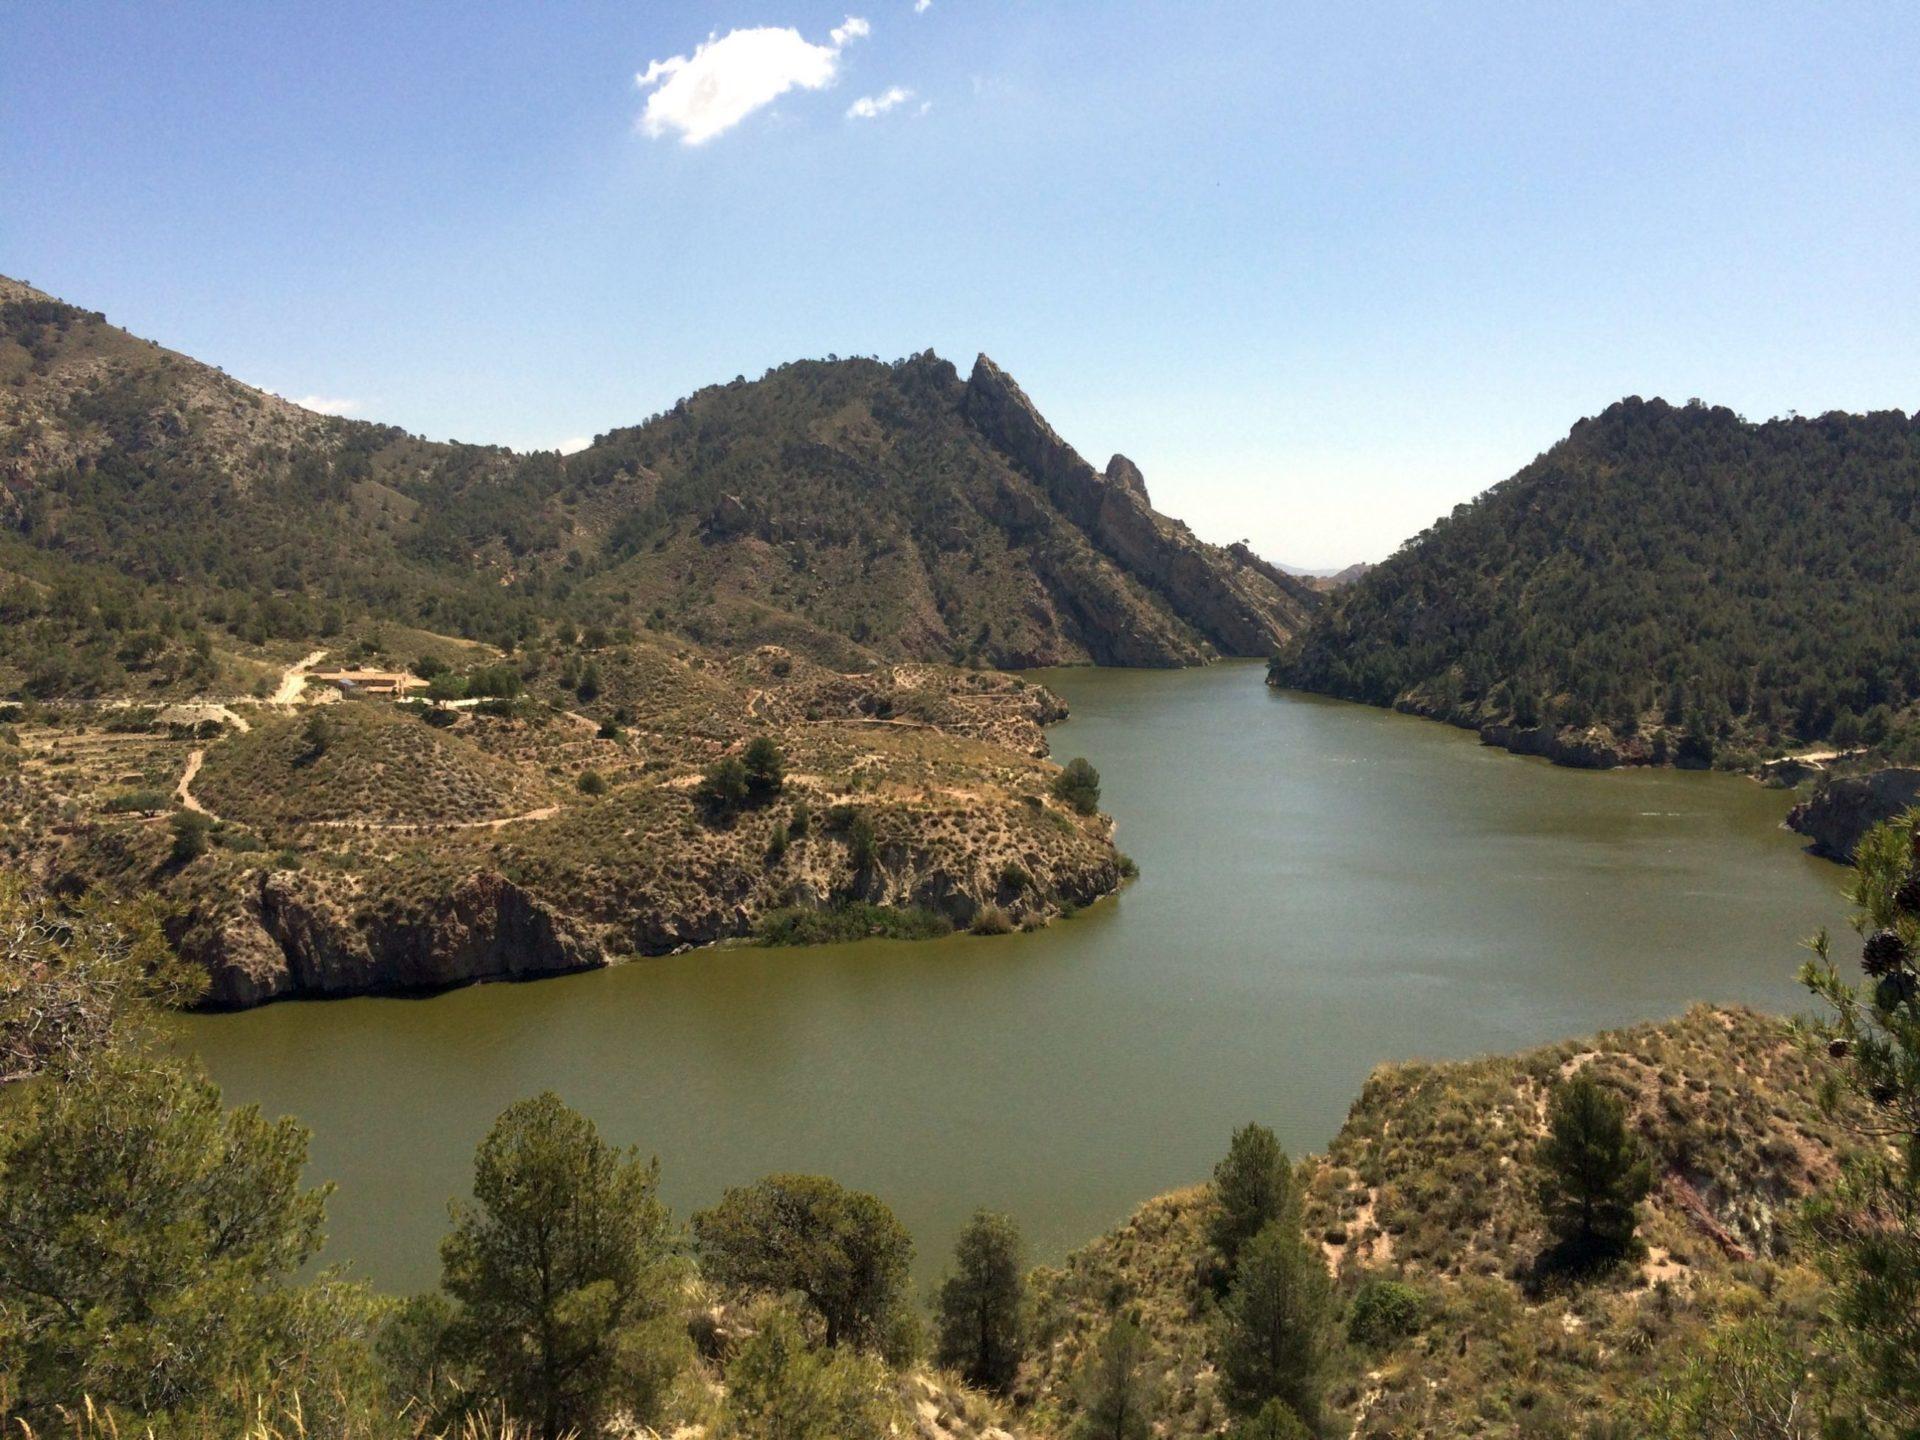 Pantano de Tibi (Alicante)- Imagen: www.tibi.es